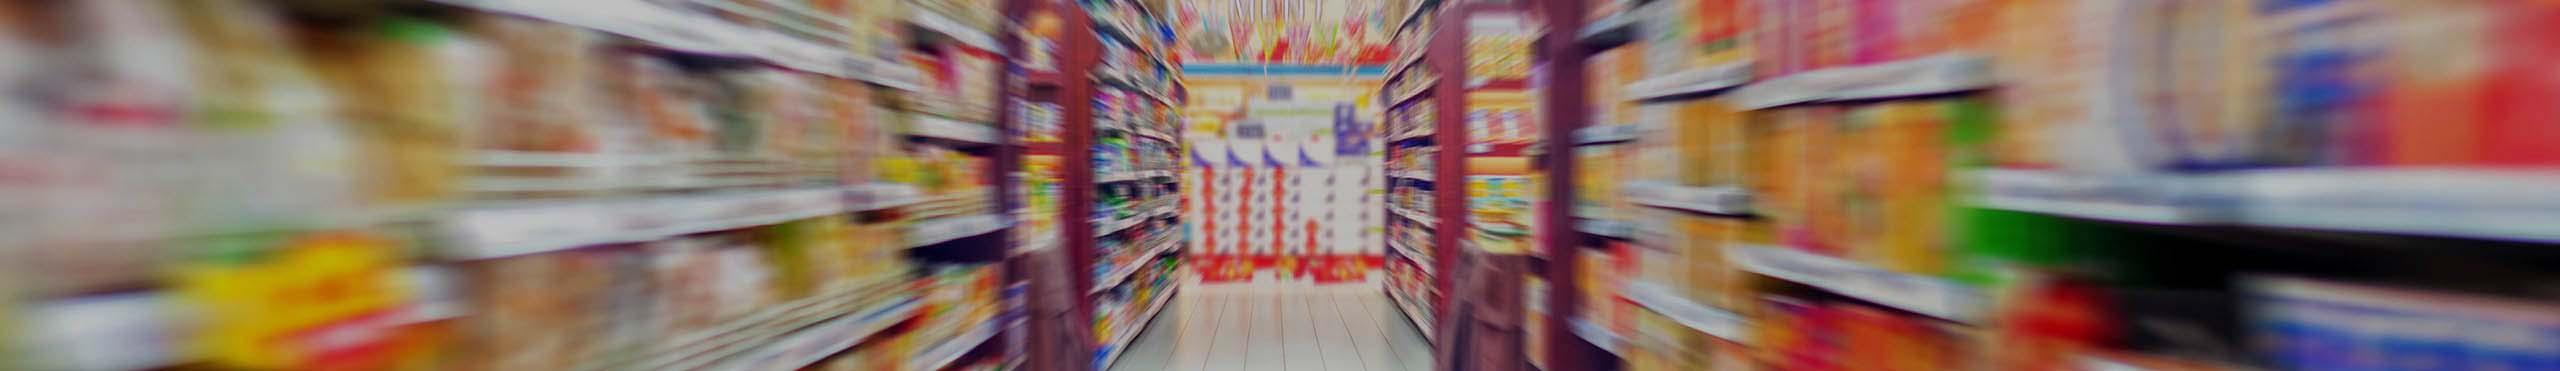 Carrefour : panier commun avec Tesco